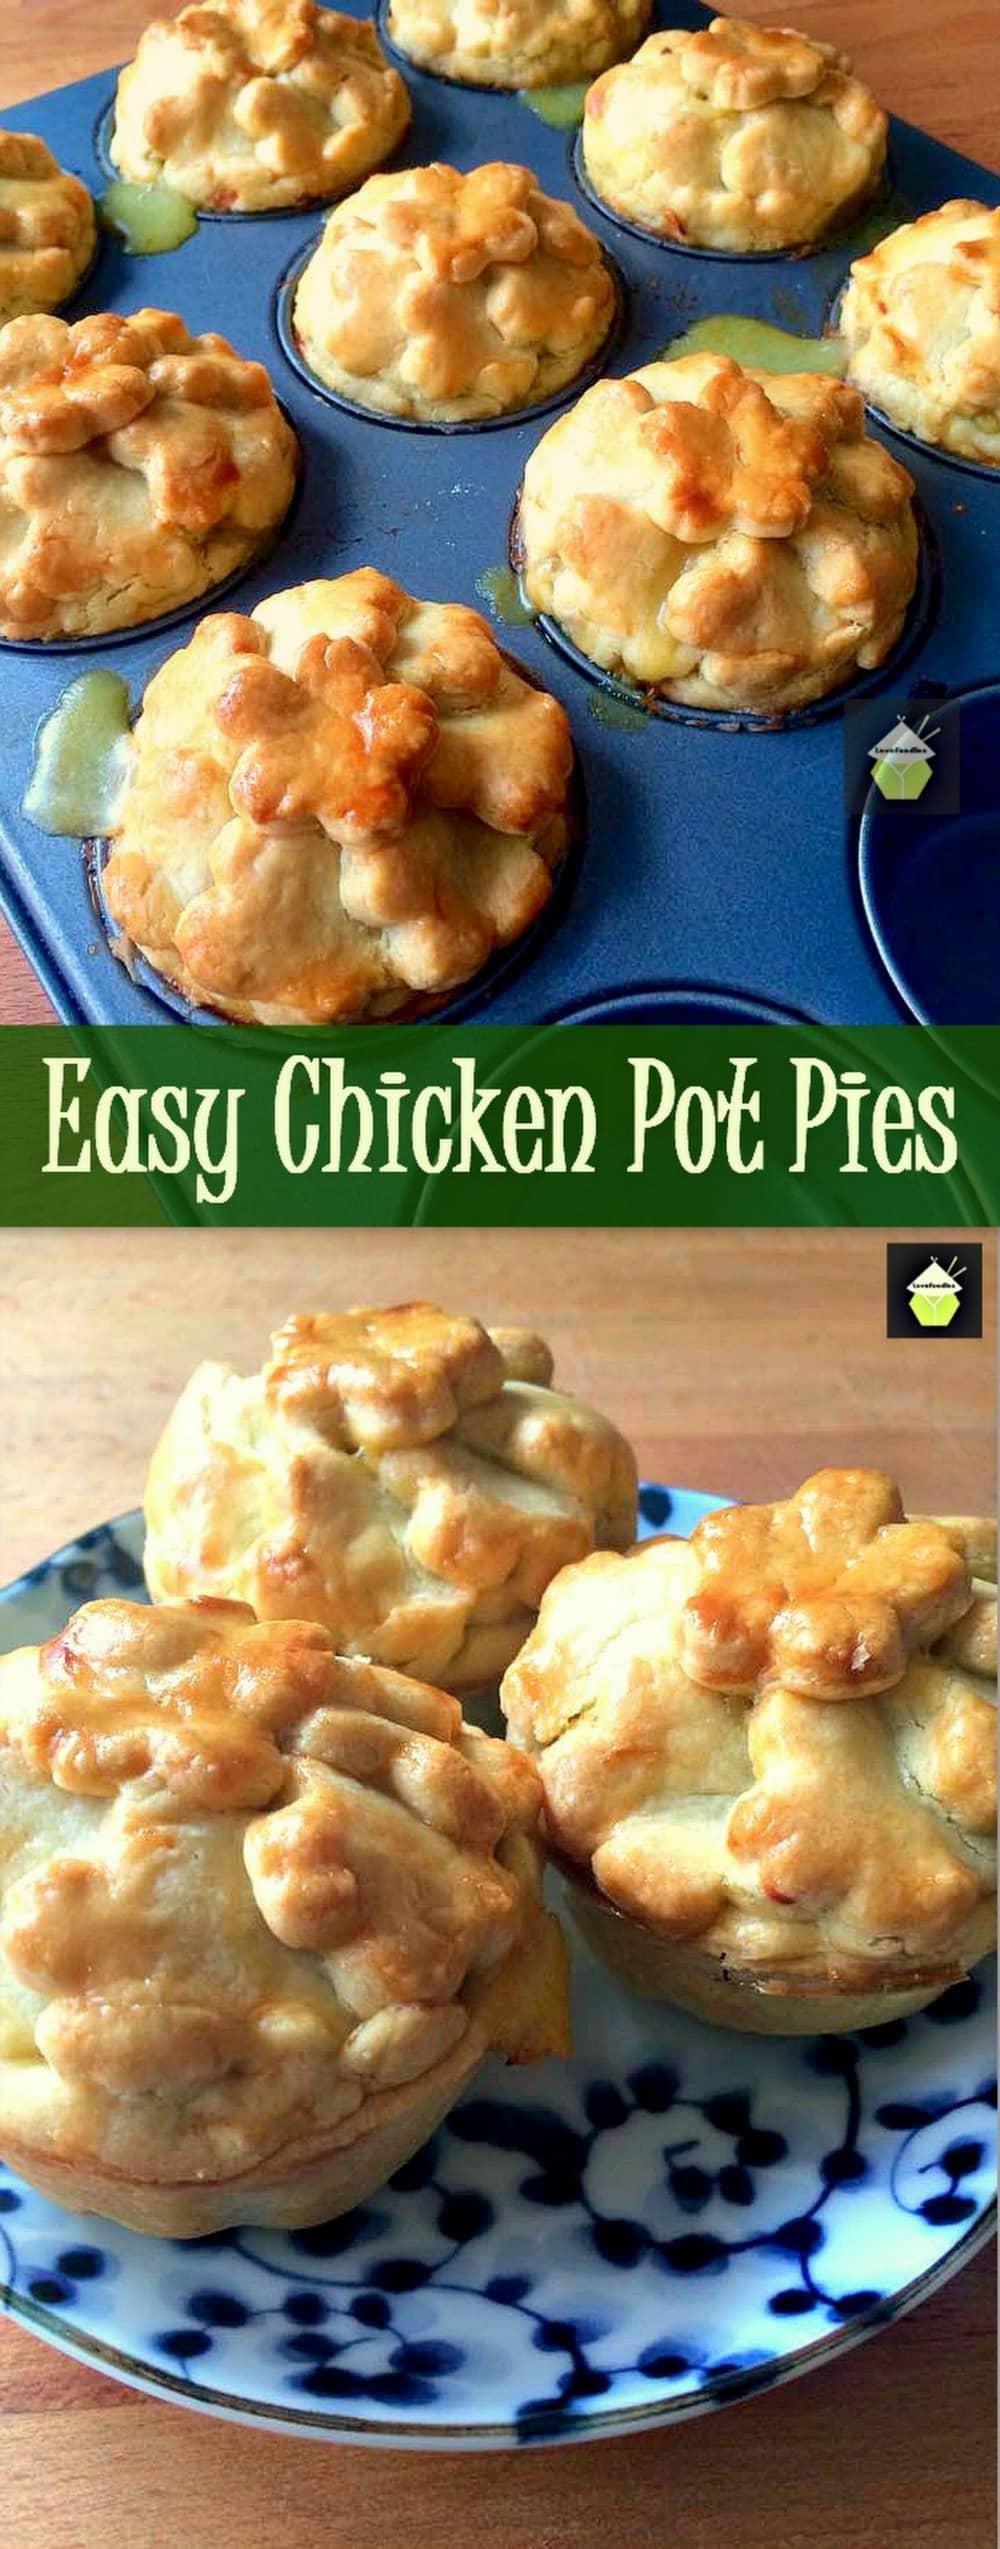 Easy Mini Chicken Pot Pies – Lovefoodies